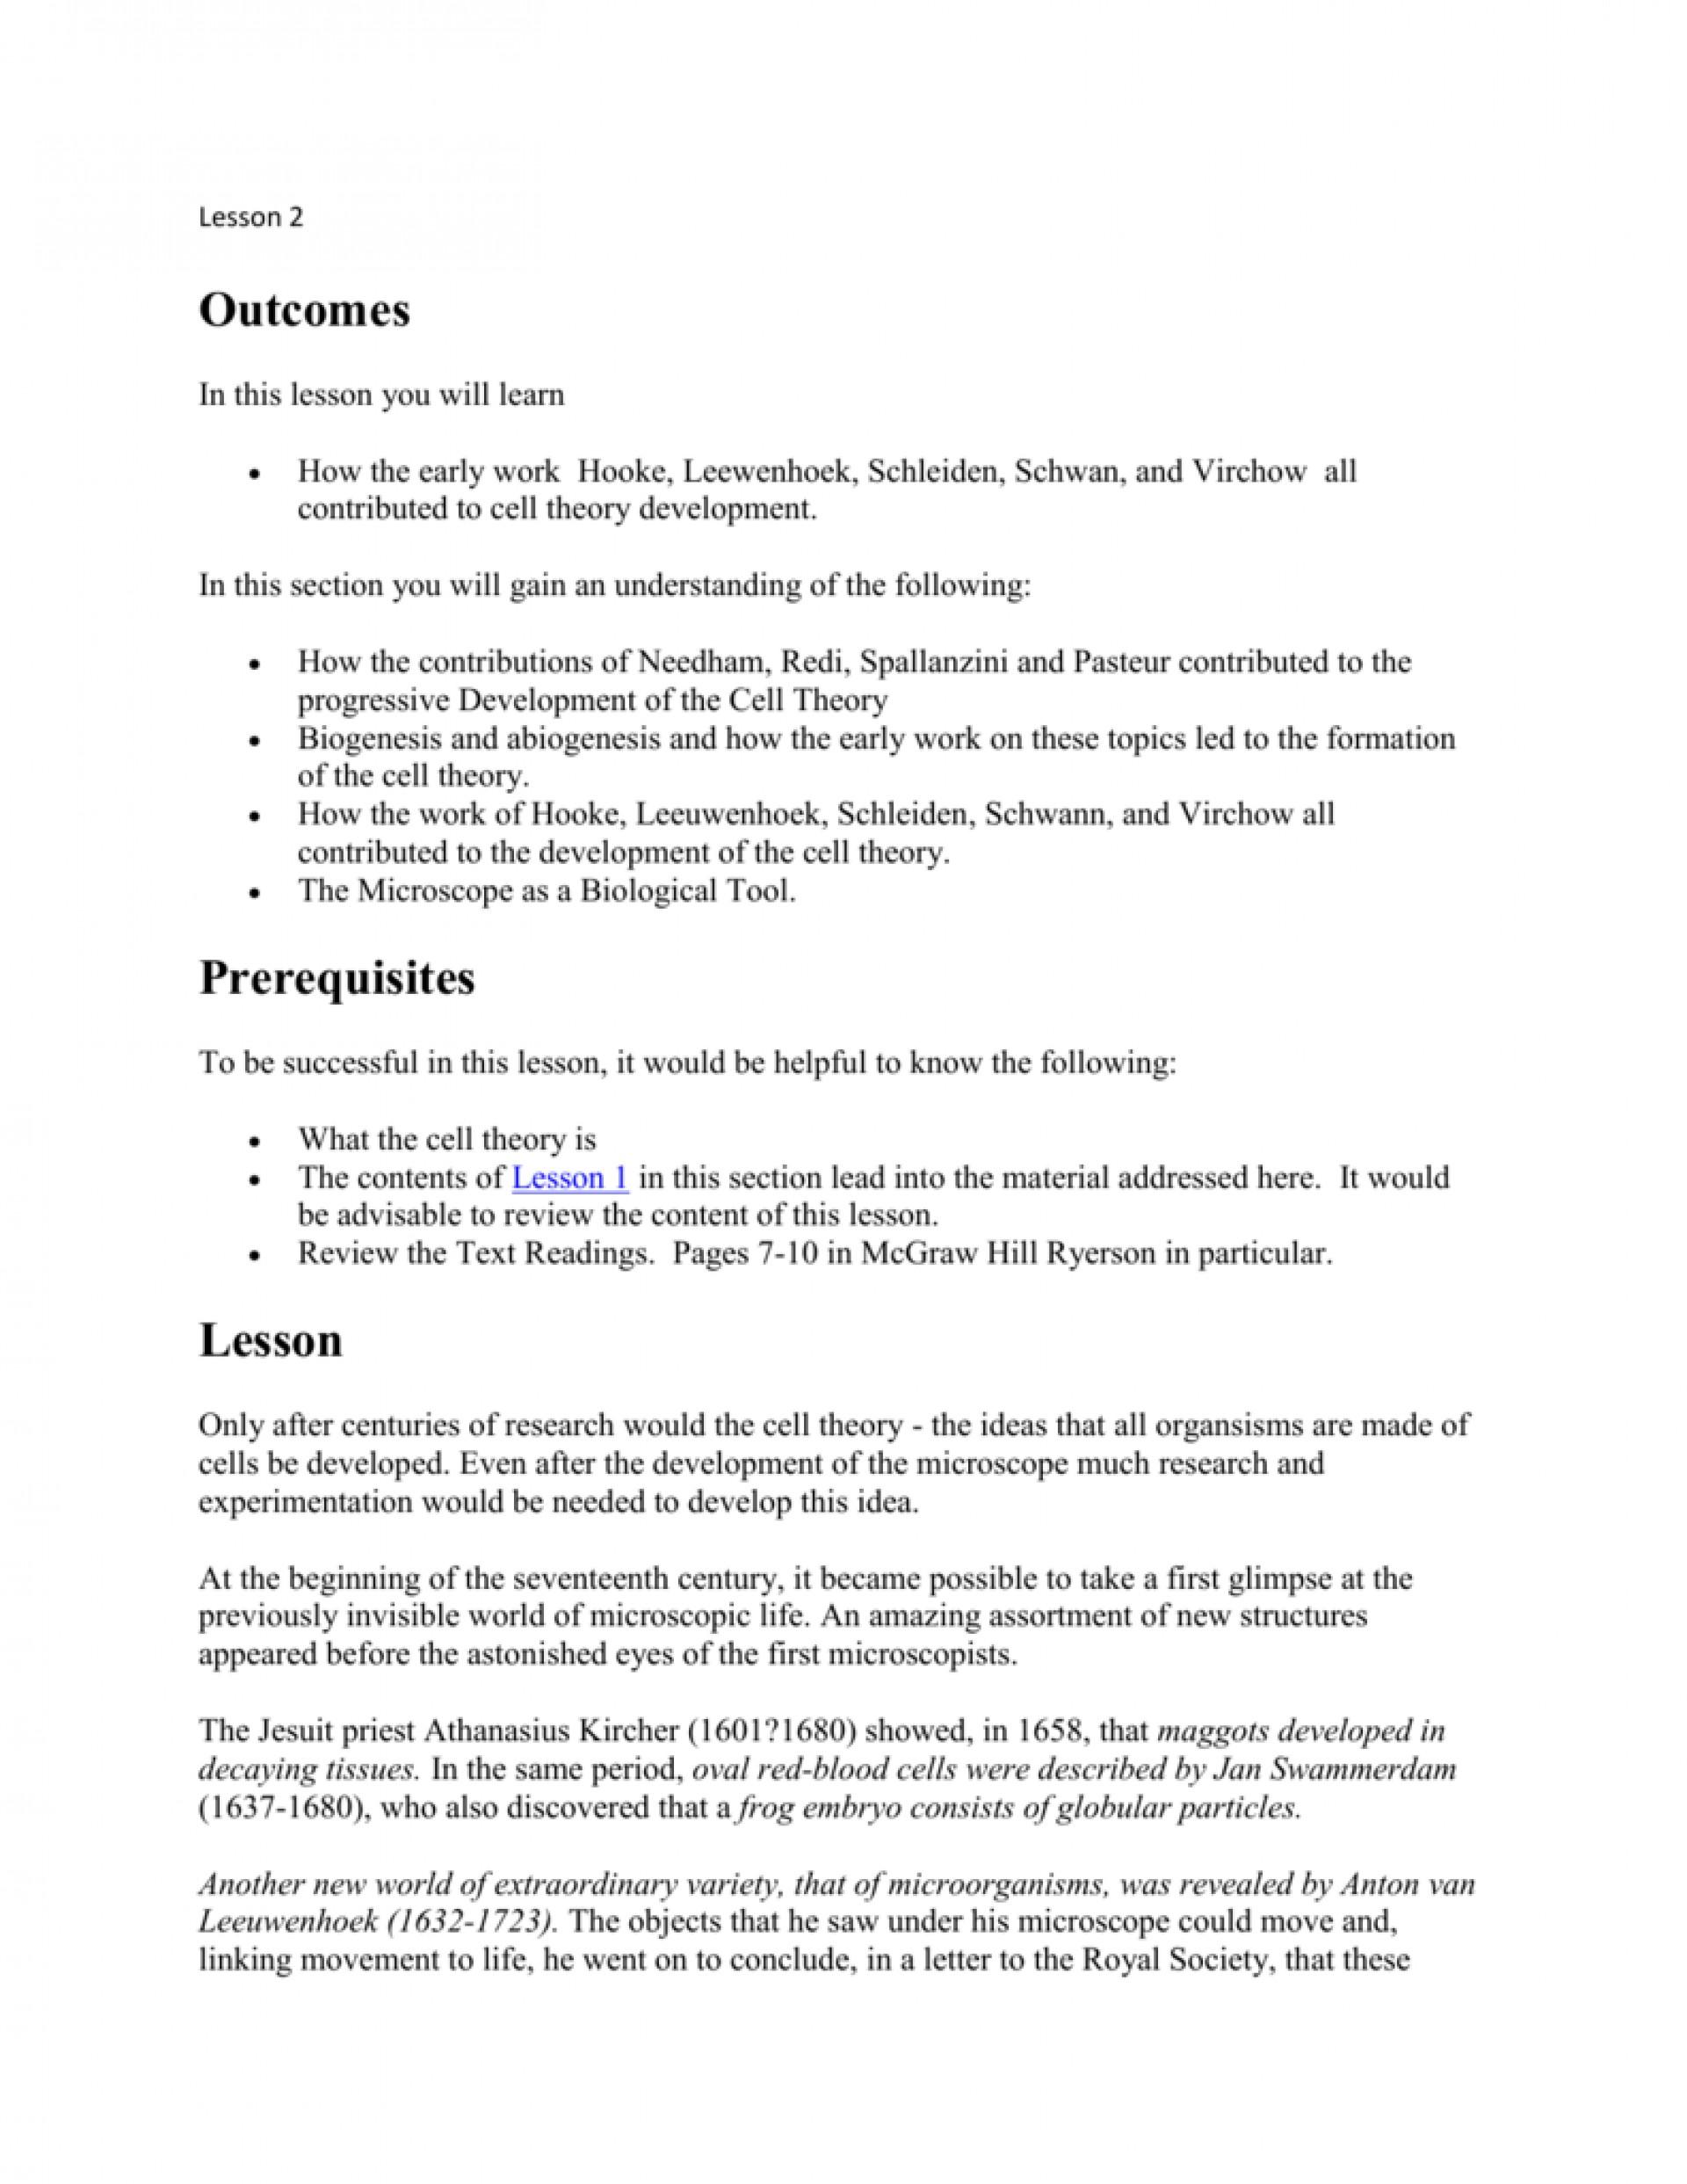 013 009009493 1 Essay Example Argumentative Unique Pdf Rubric High School Writing Sample 1920